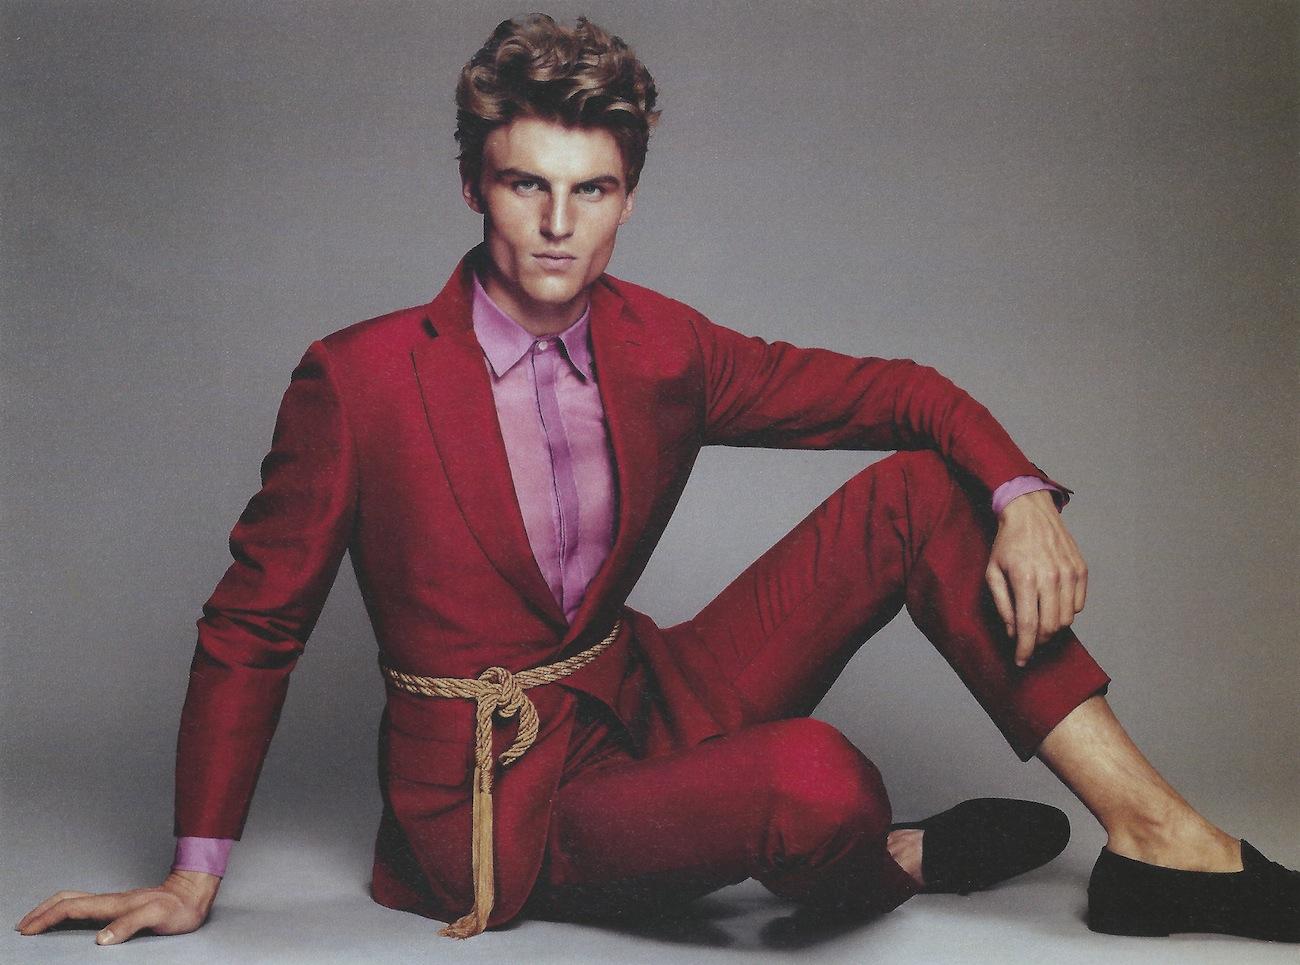 Reid Prebenda Models Spring Suits for Hercules